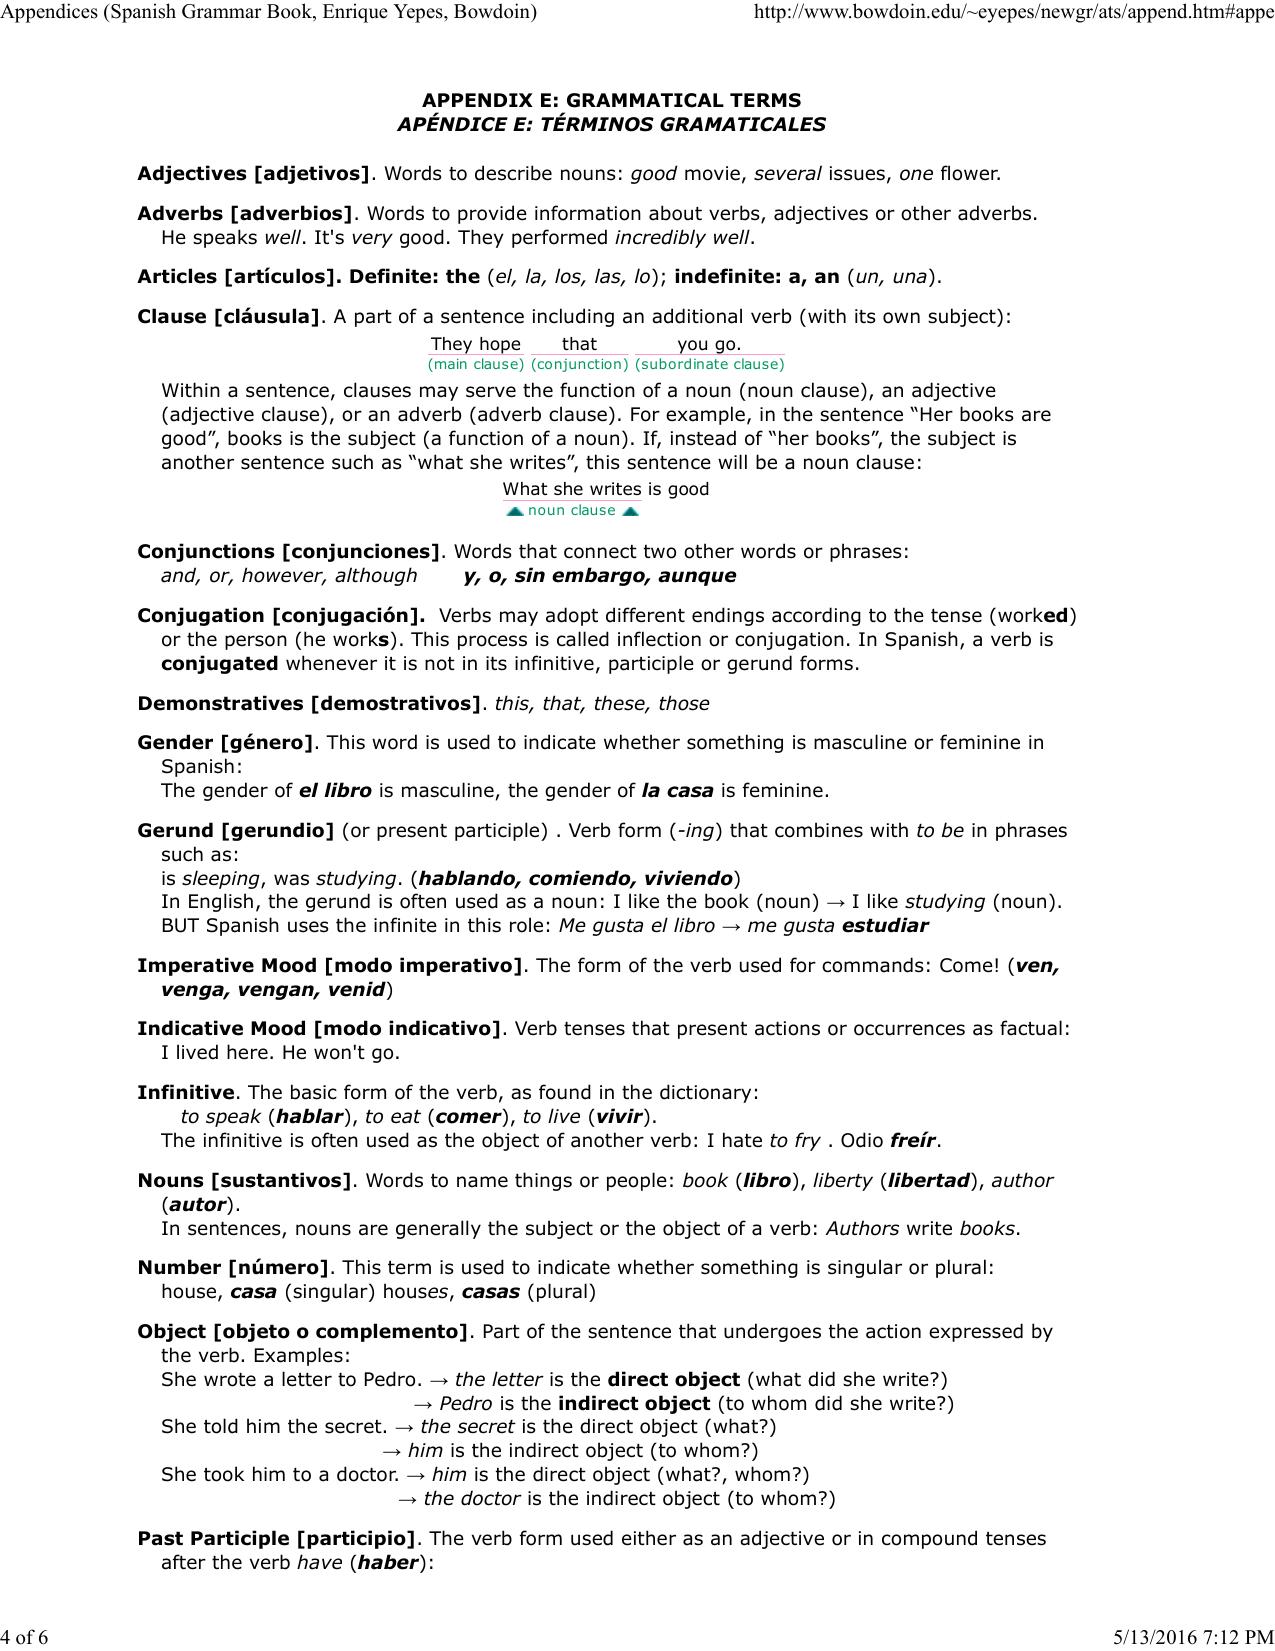 Appendices (Spanish Grammar Book, Enrique Yepes, Bowdoin) http